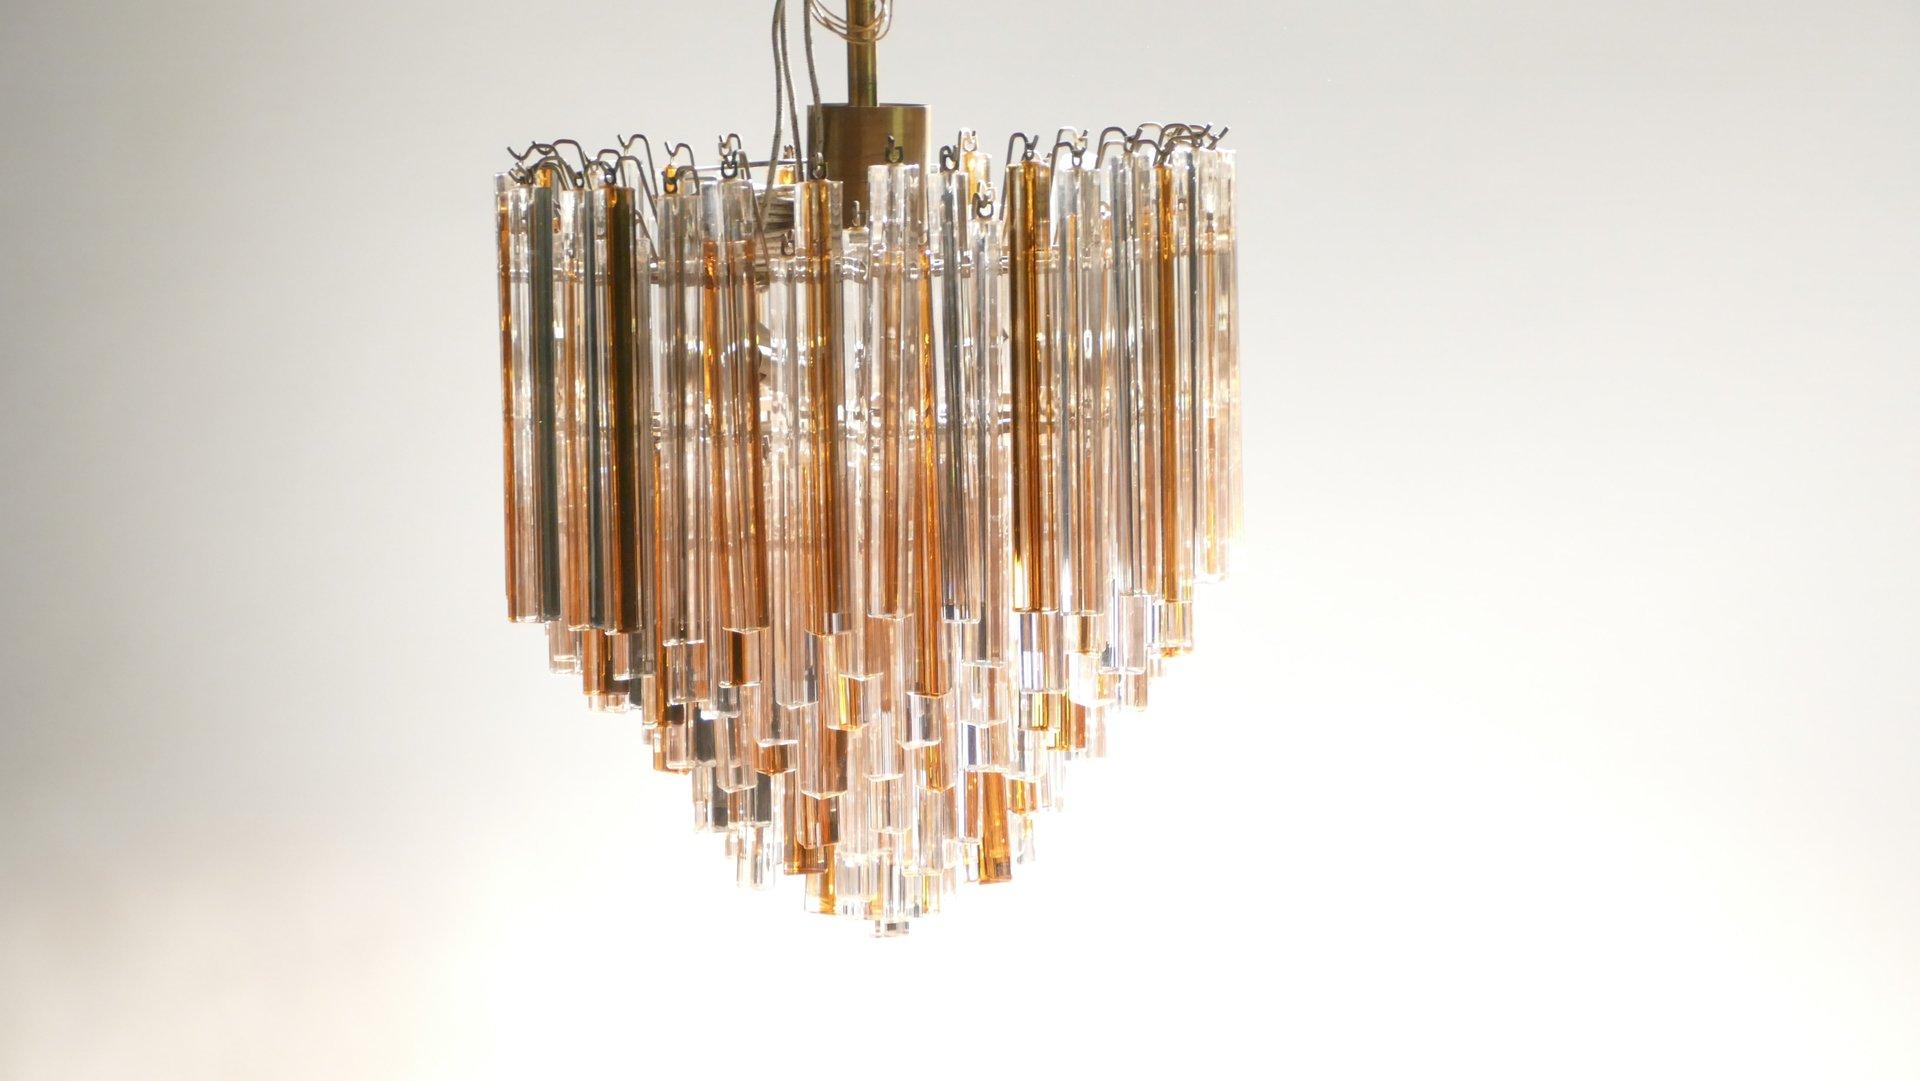 The crystal chandelier crystal beach best home designesome 100 chinese chandelier 328 best chandeliers on the web imag arubaitofo Choice Image